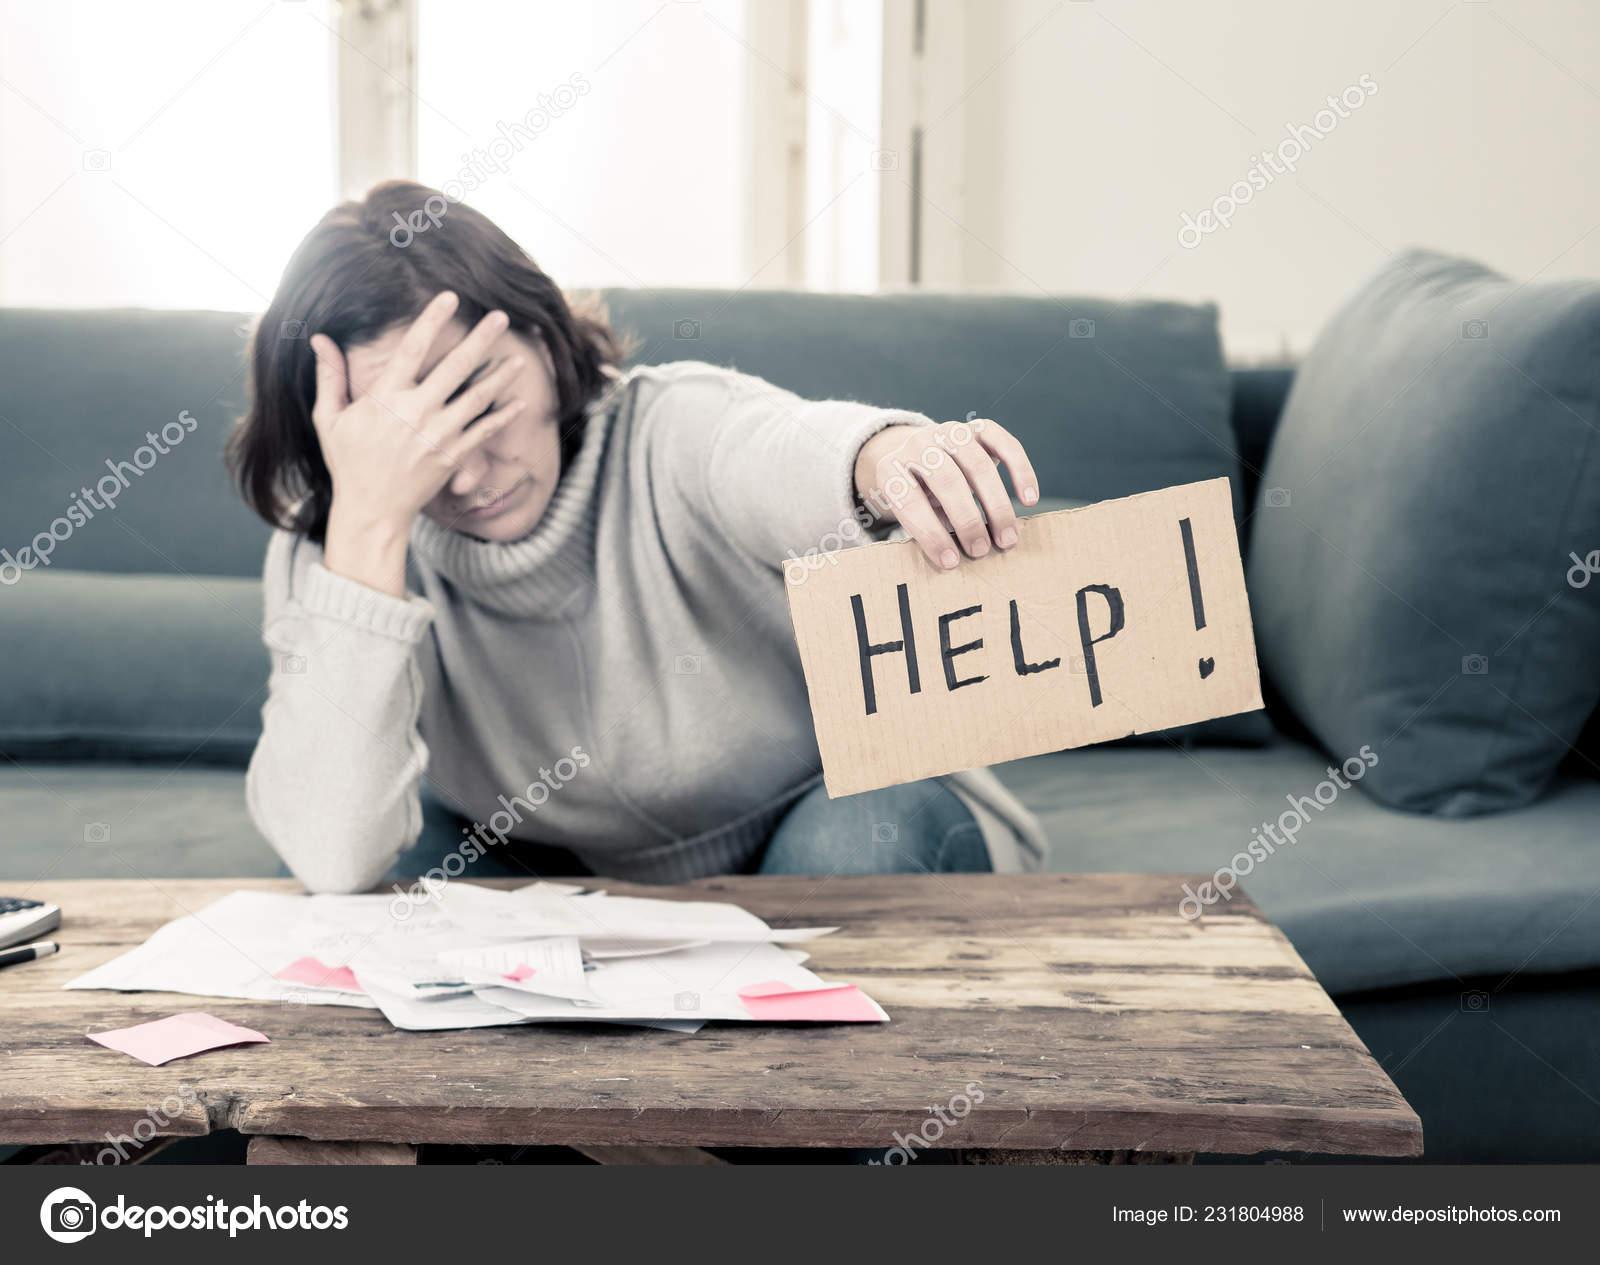 make americas finances worse - HD1600×1254